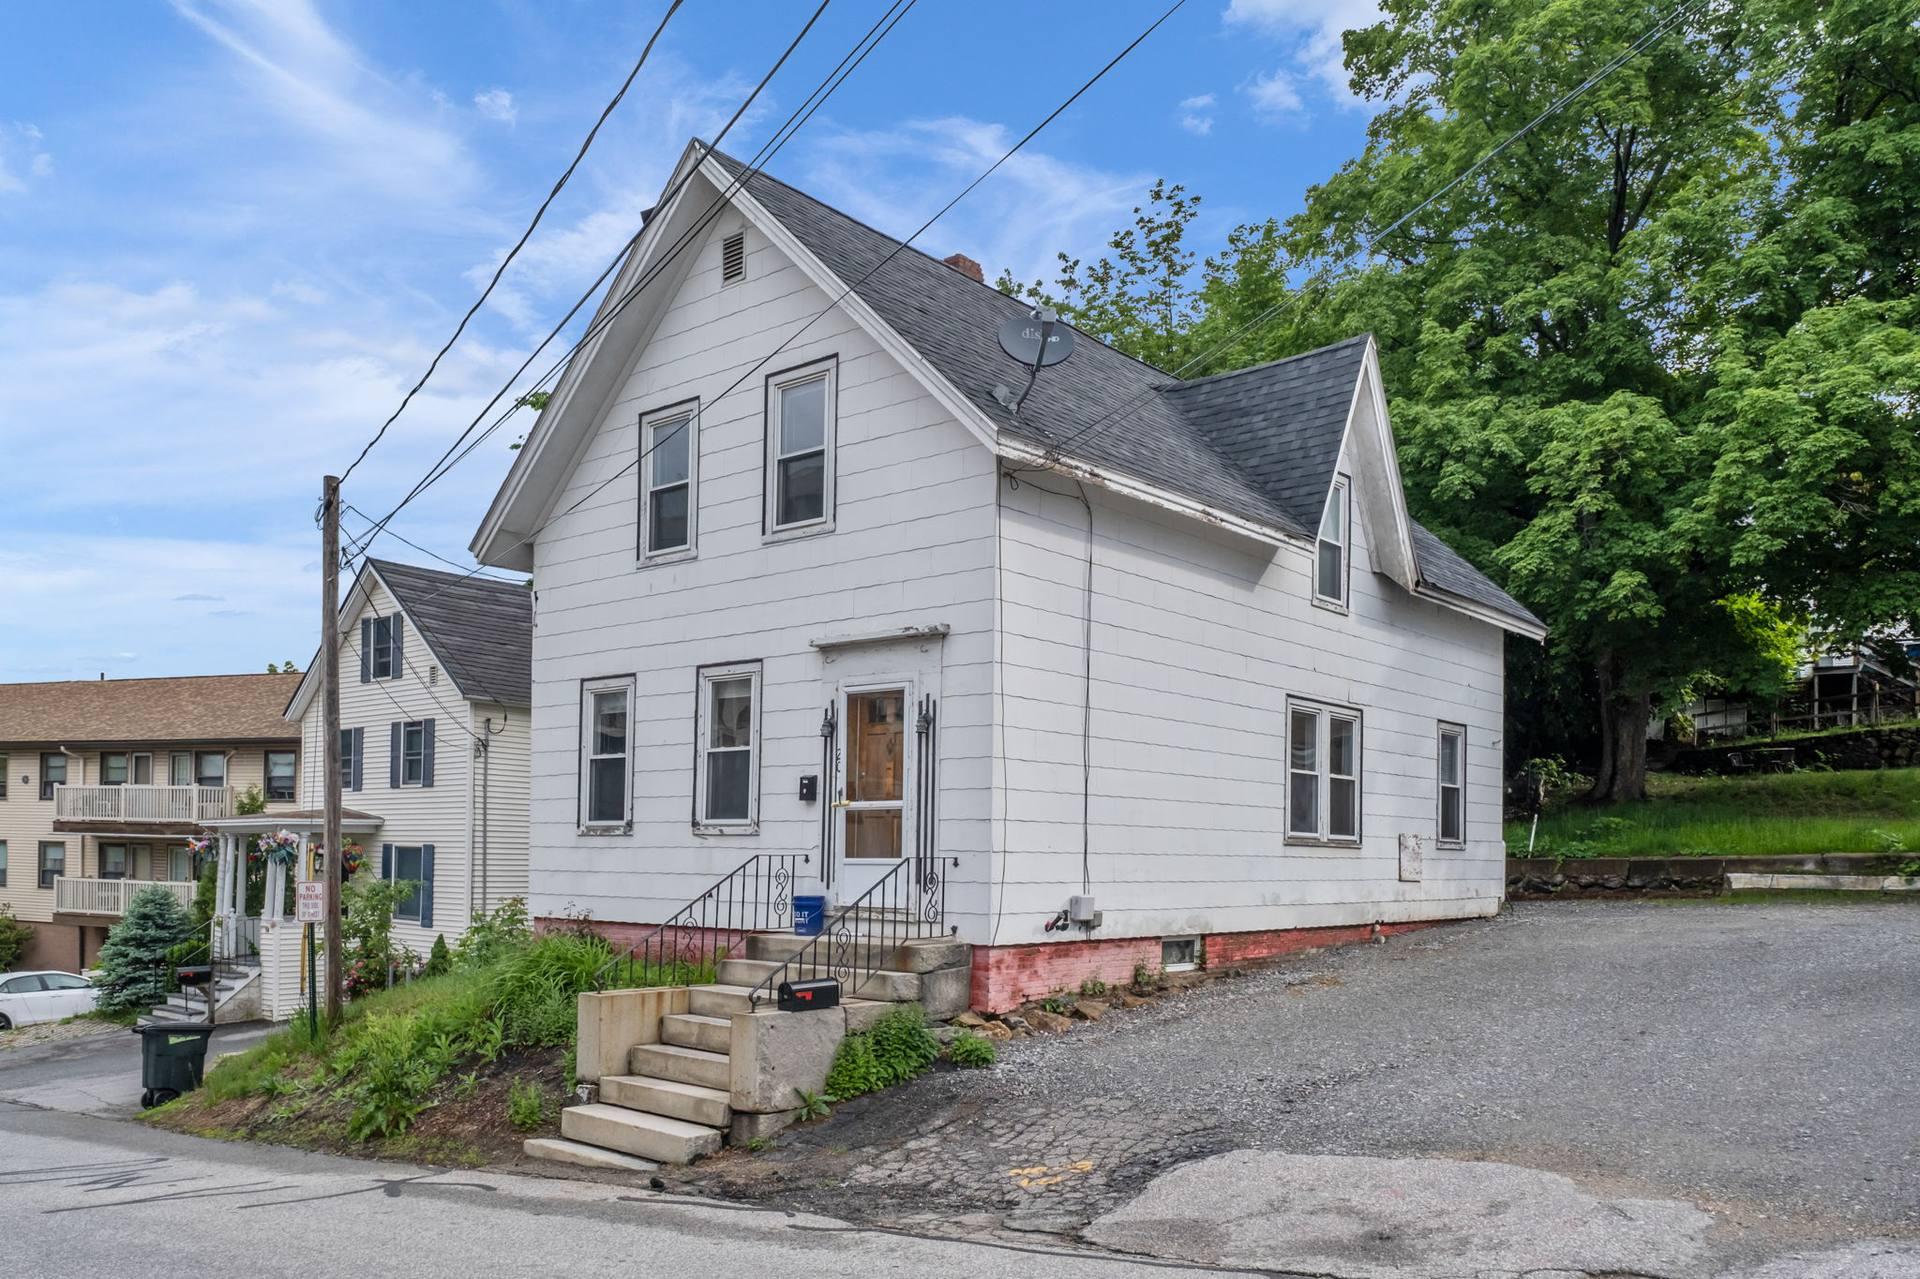 20 Baldwin St, Laconia, NH 03246, US